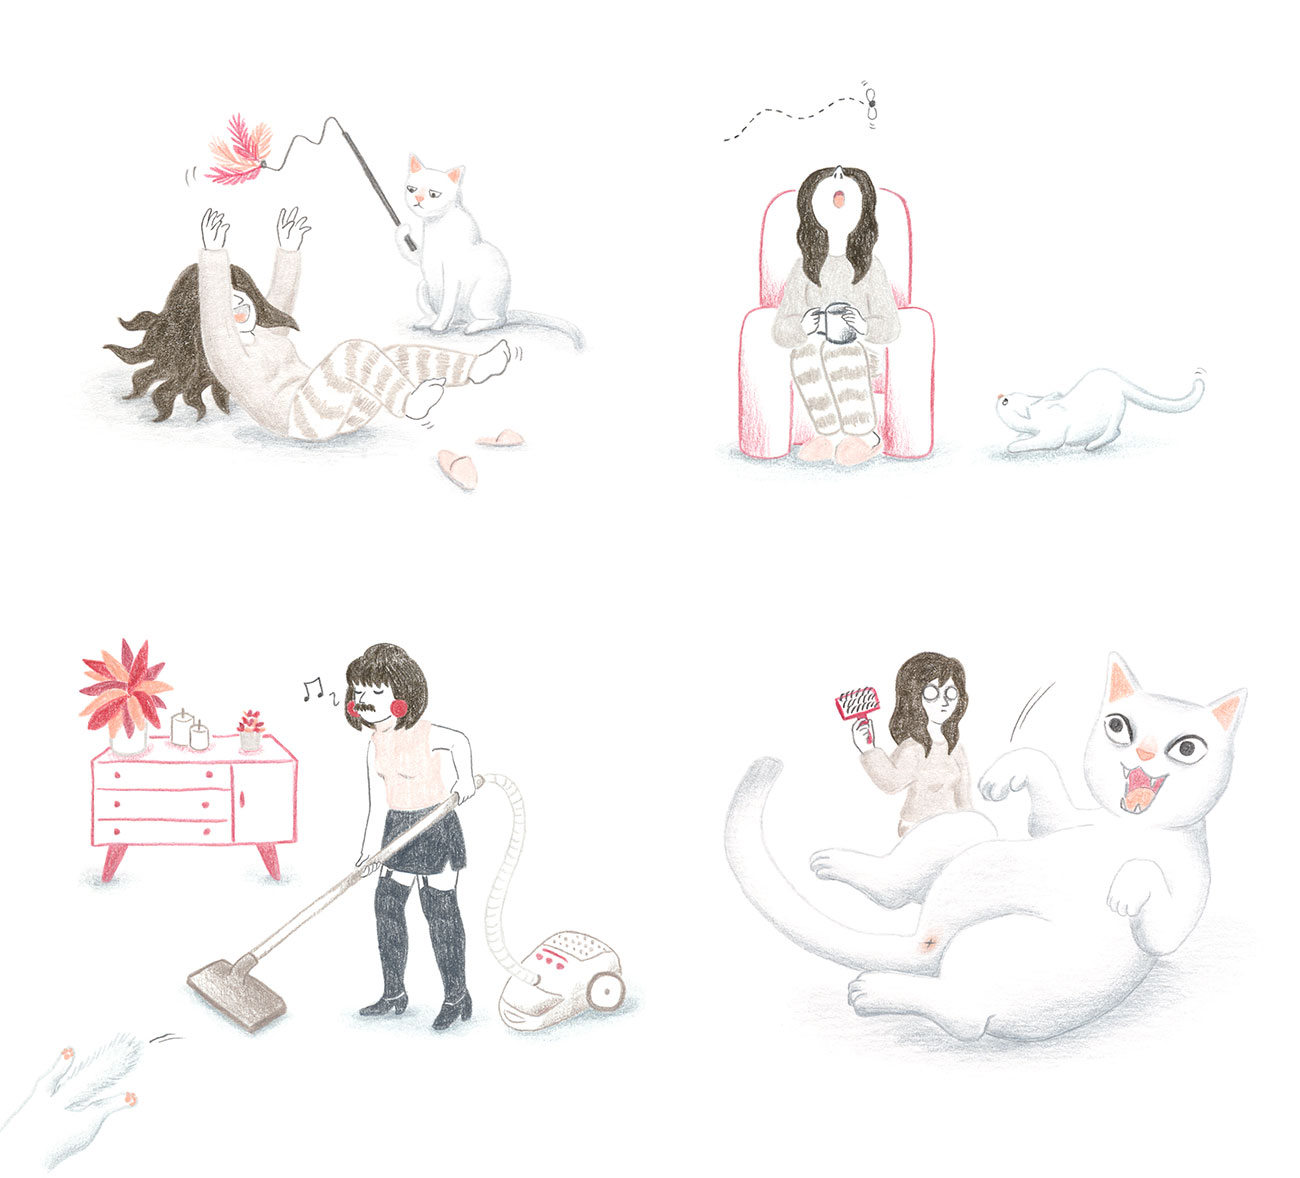 Distracción, Trucos de organización para ilustradores que empiezan, organización para ilustradores, Mar Villar, procrastinar, gato cazando mosca, Freddie Mercury, I want to break free, cepillar gato, jugar con gato, plumero gato